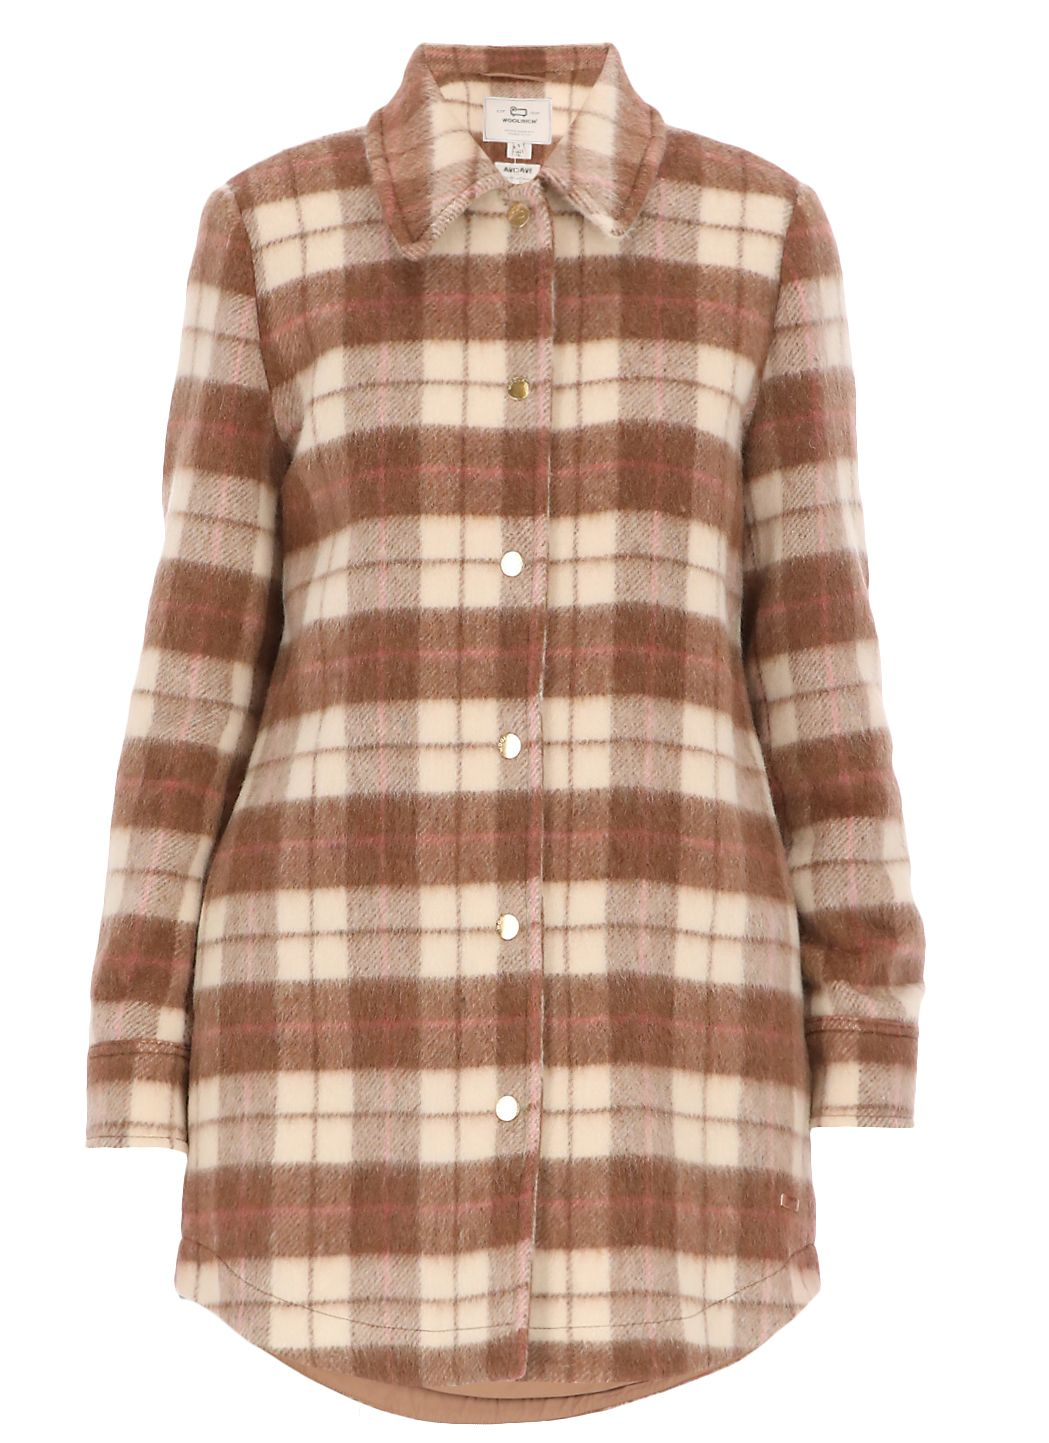 Giacca camicia in misto lana